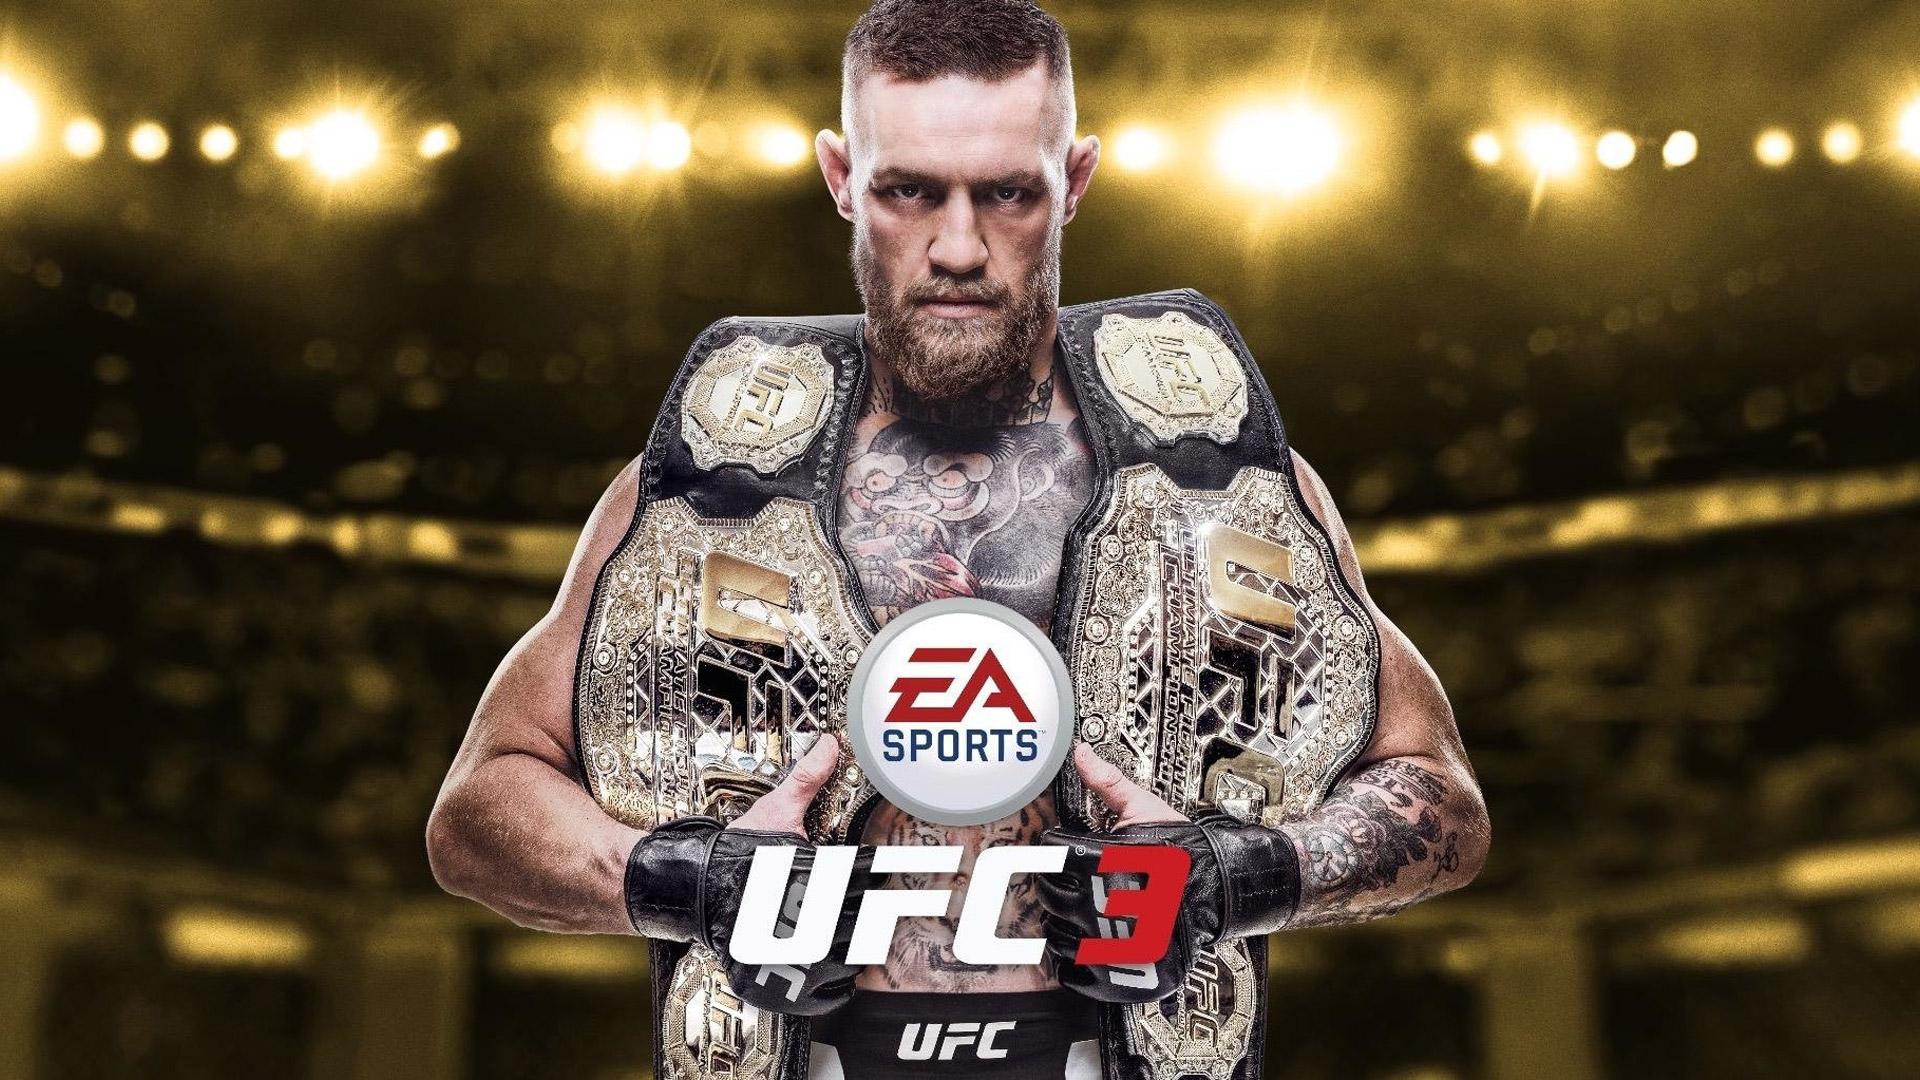 Free EA Sports UFC 3 Wallpaper in 1920x1080